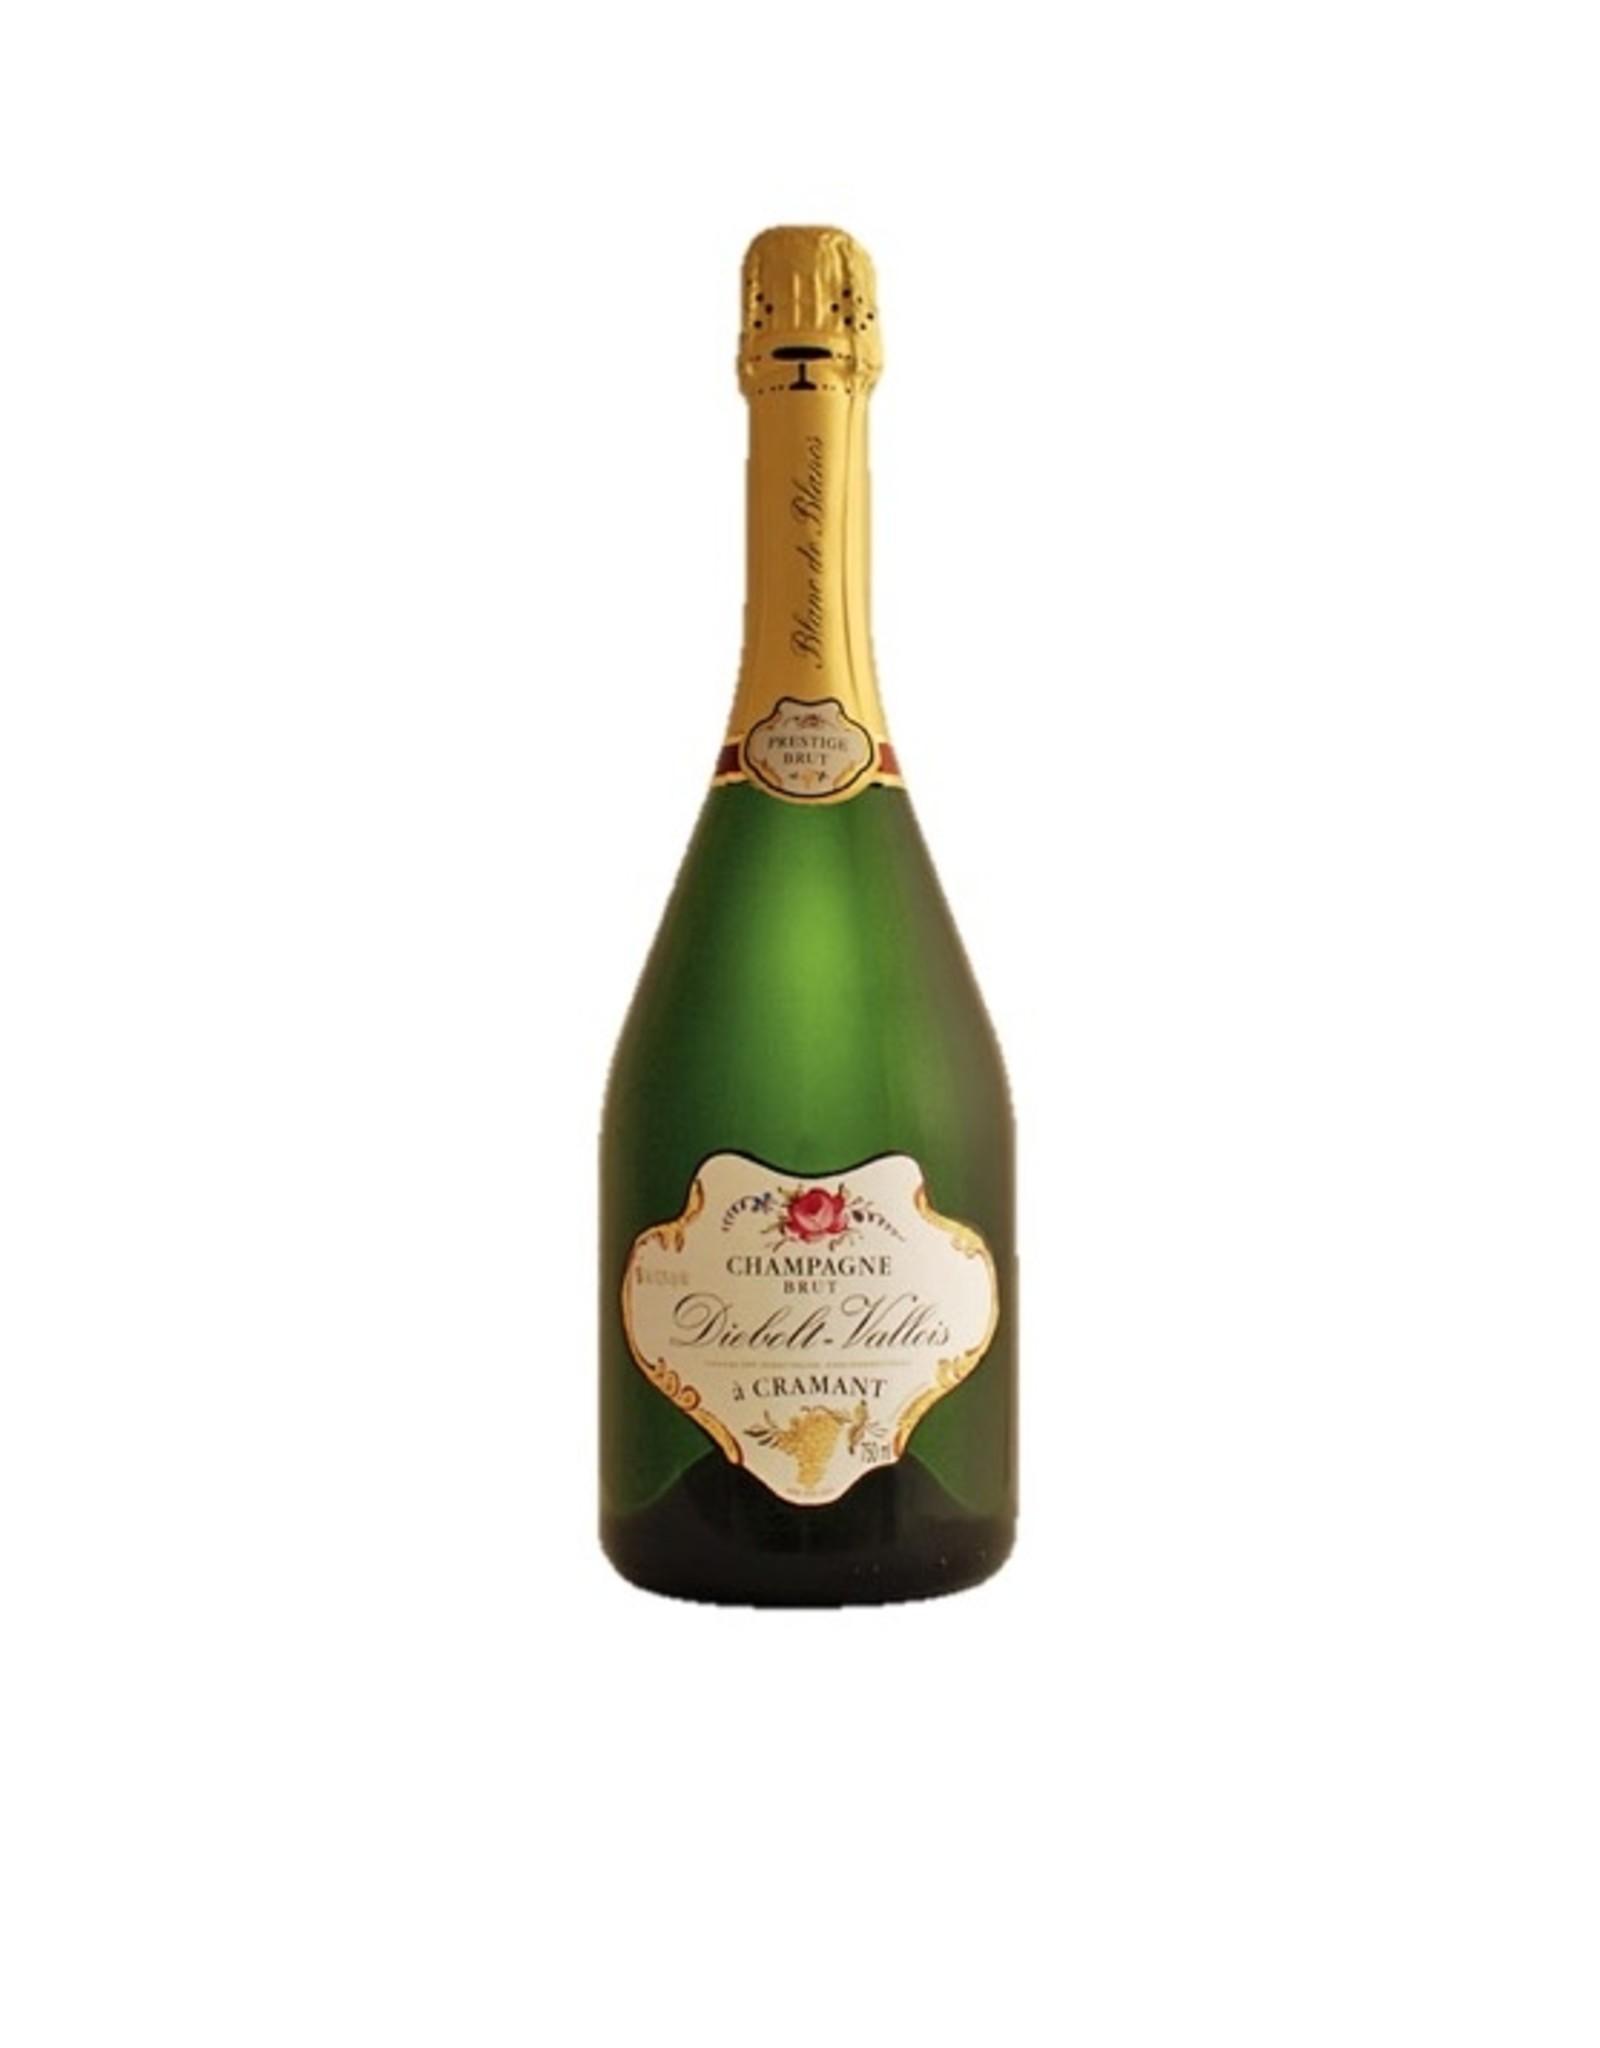 Diebolt-Vallois Champagne Diebolt Vallois Prestige